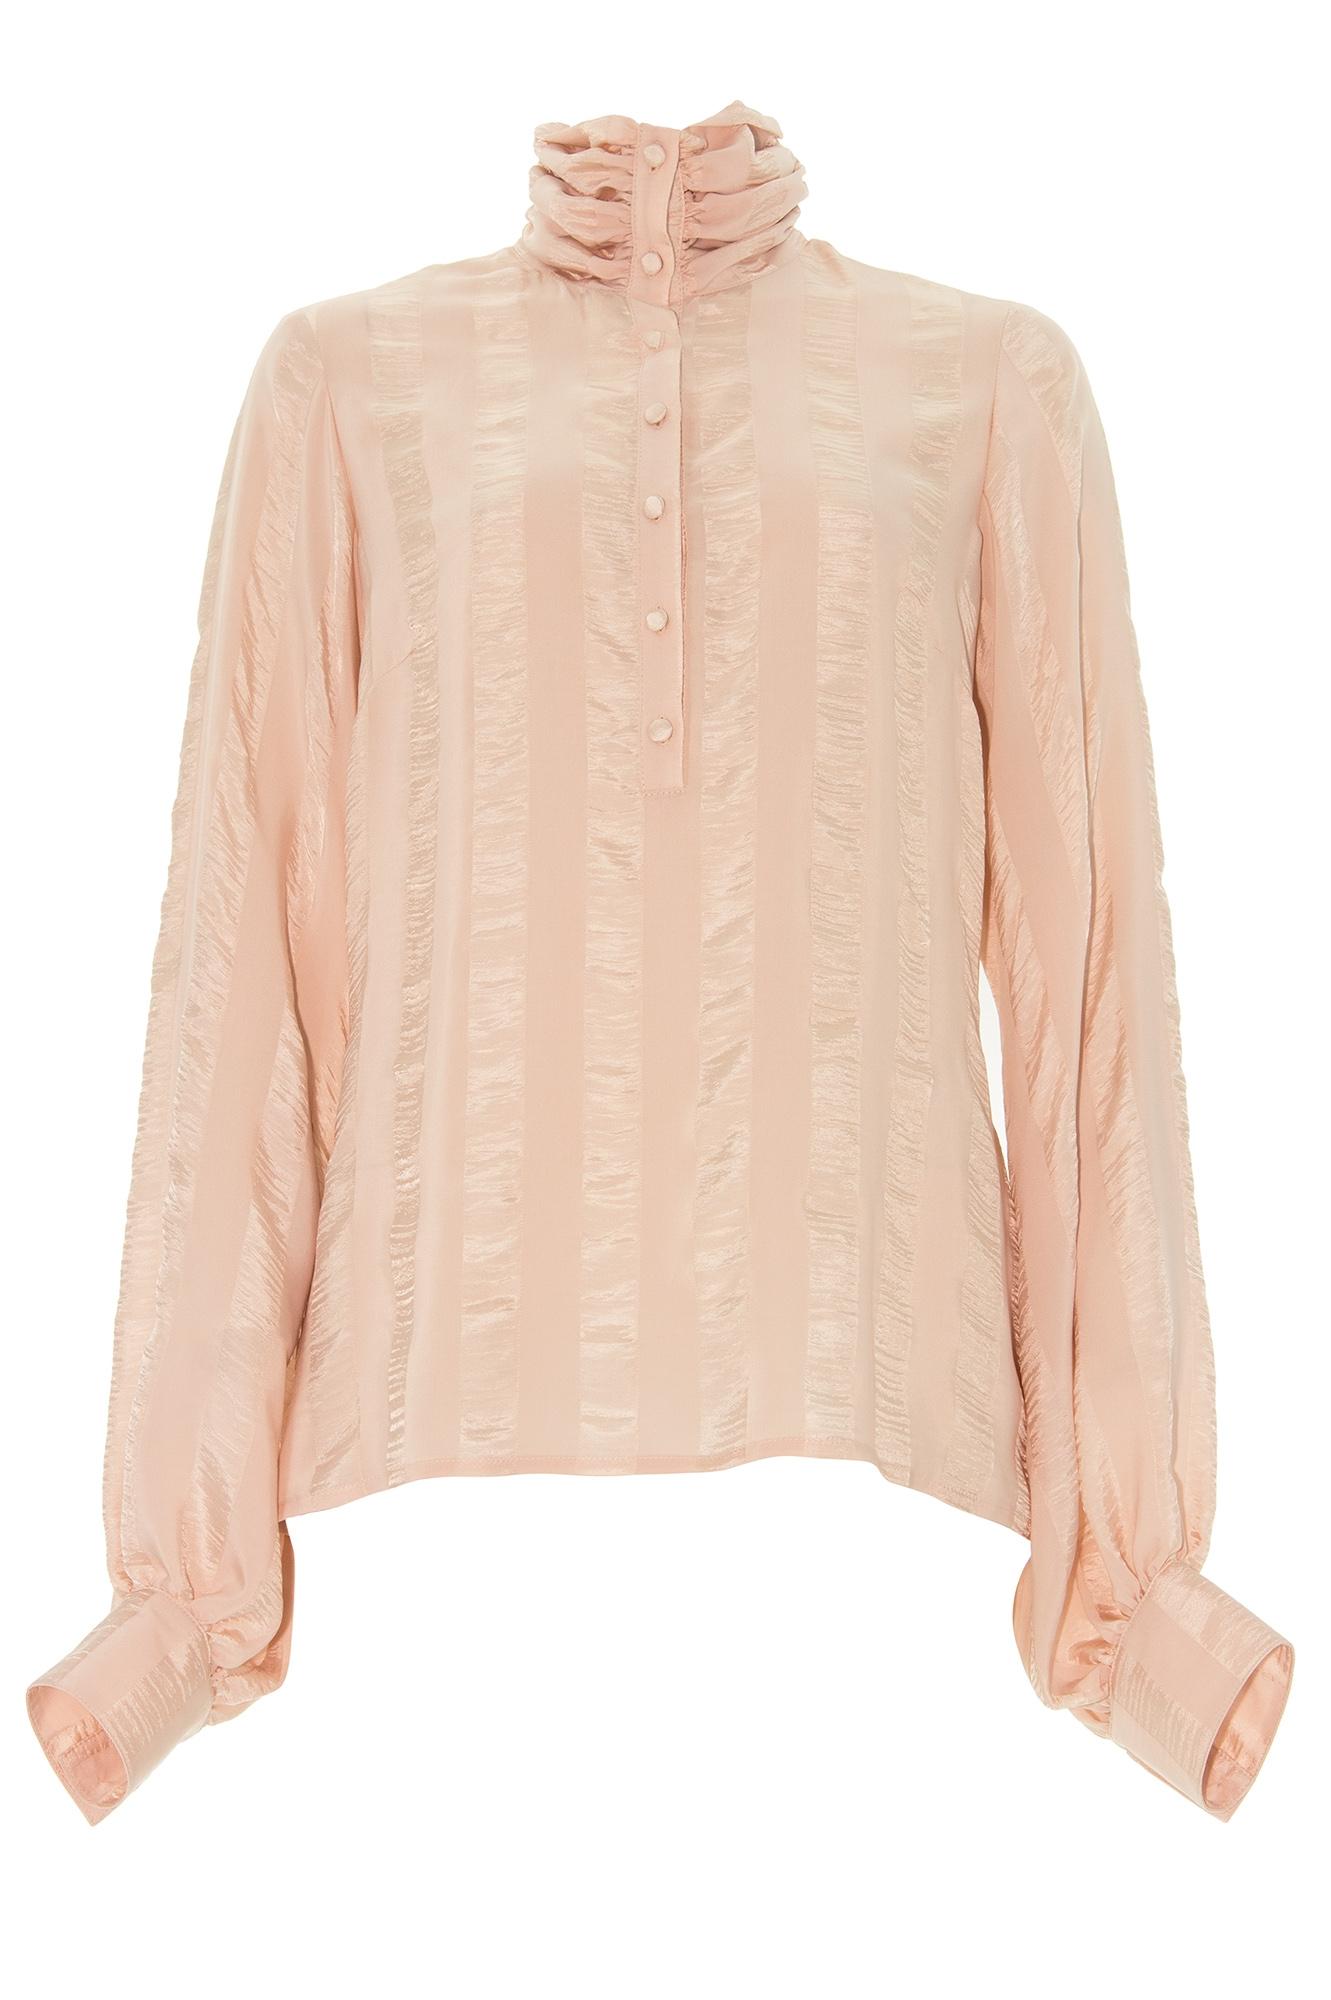 blouse habill e rose poudr stefanie renoma. Black Bedroom Furniture Sets. Home Design Ideas